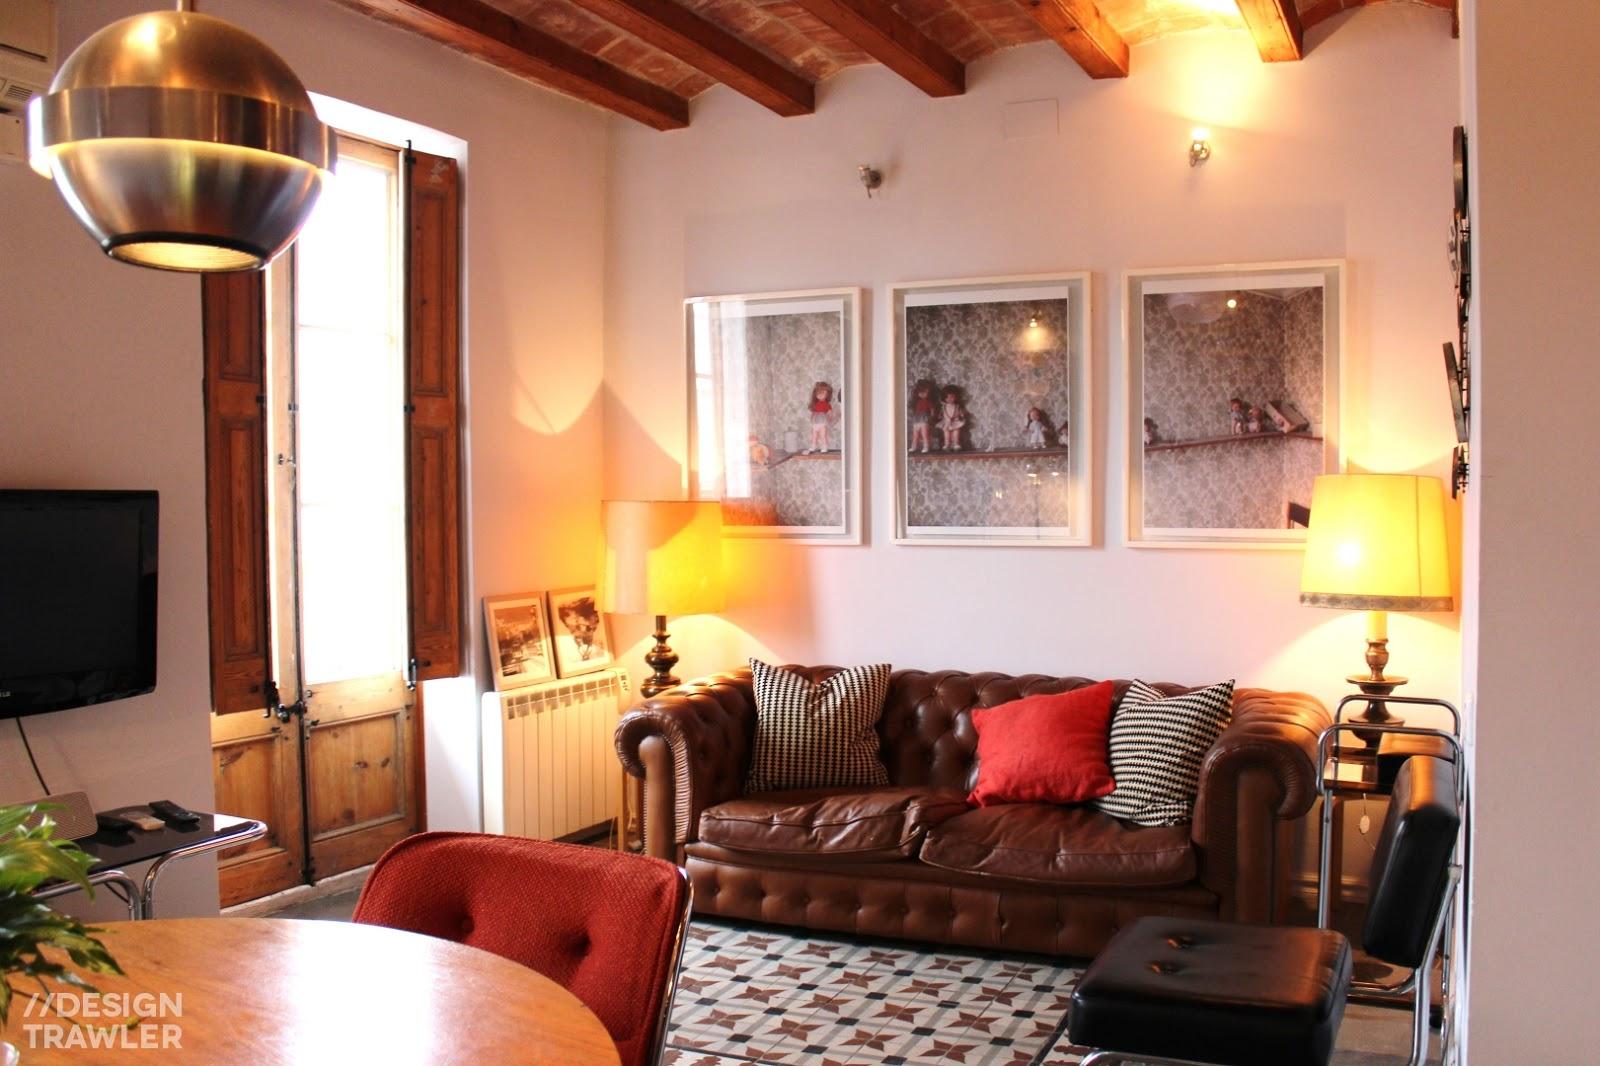 Design Trawler: Grand Hotel Barcelona